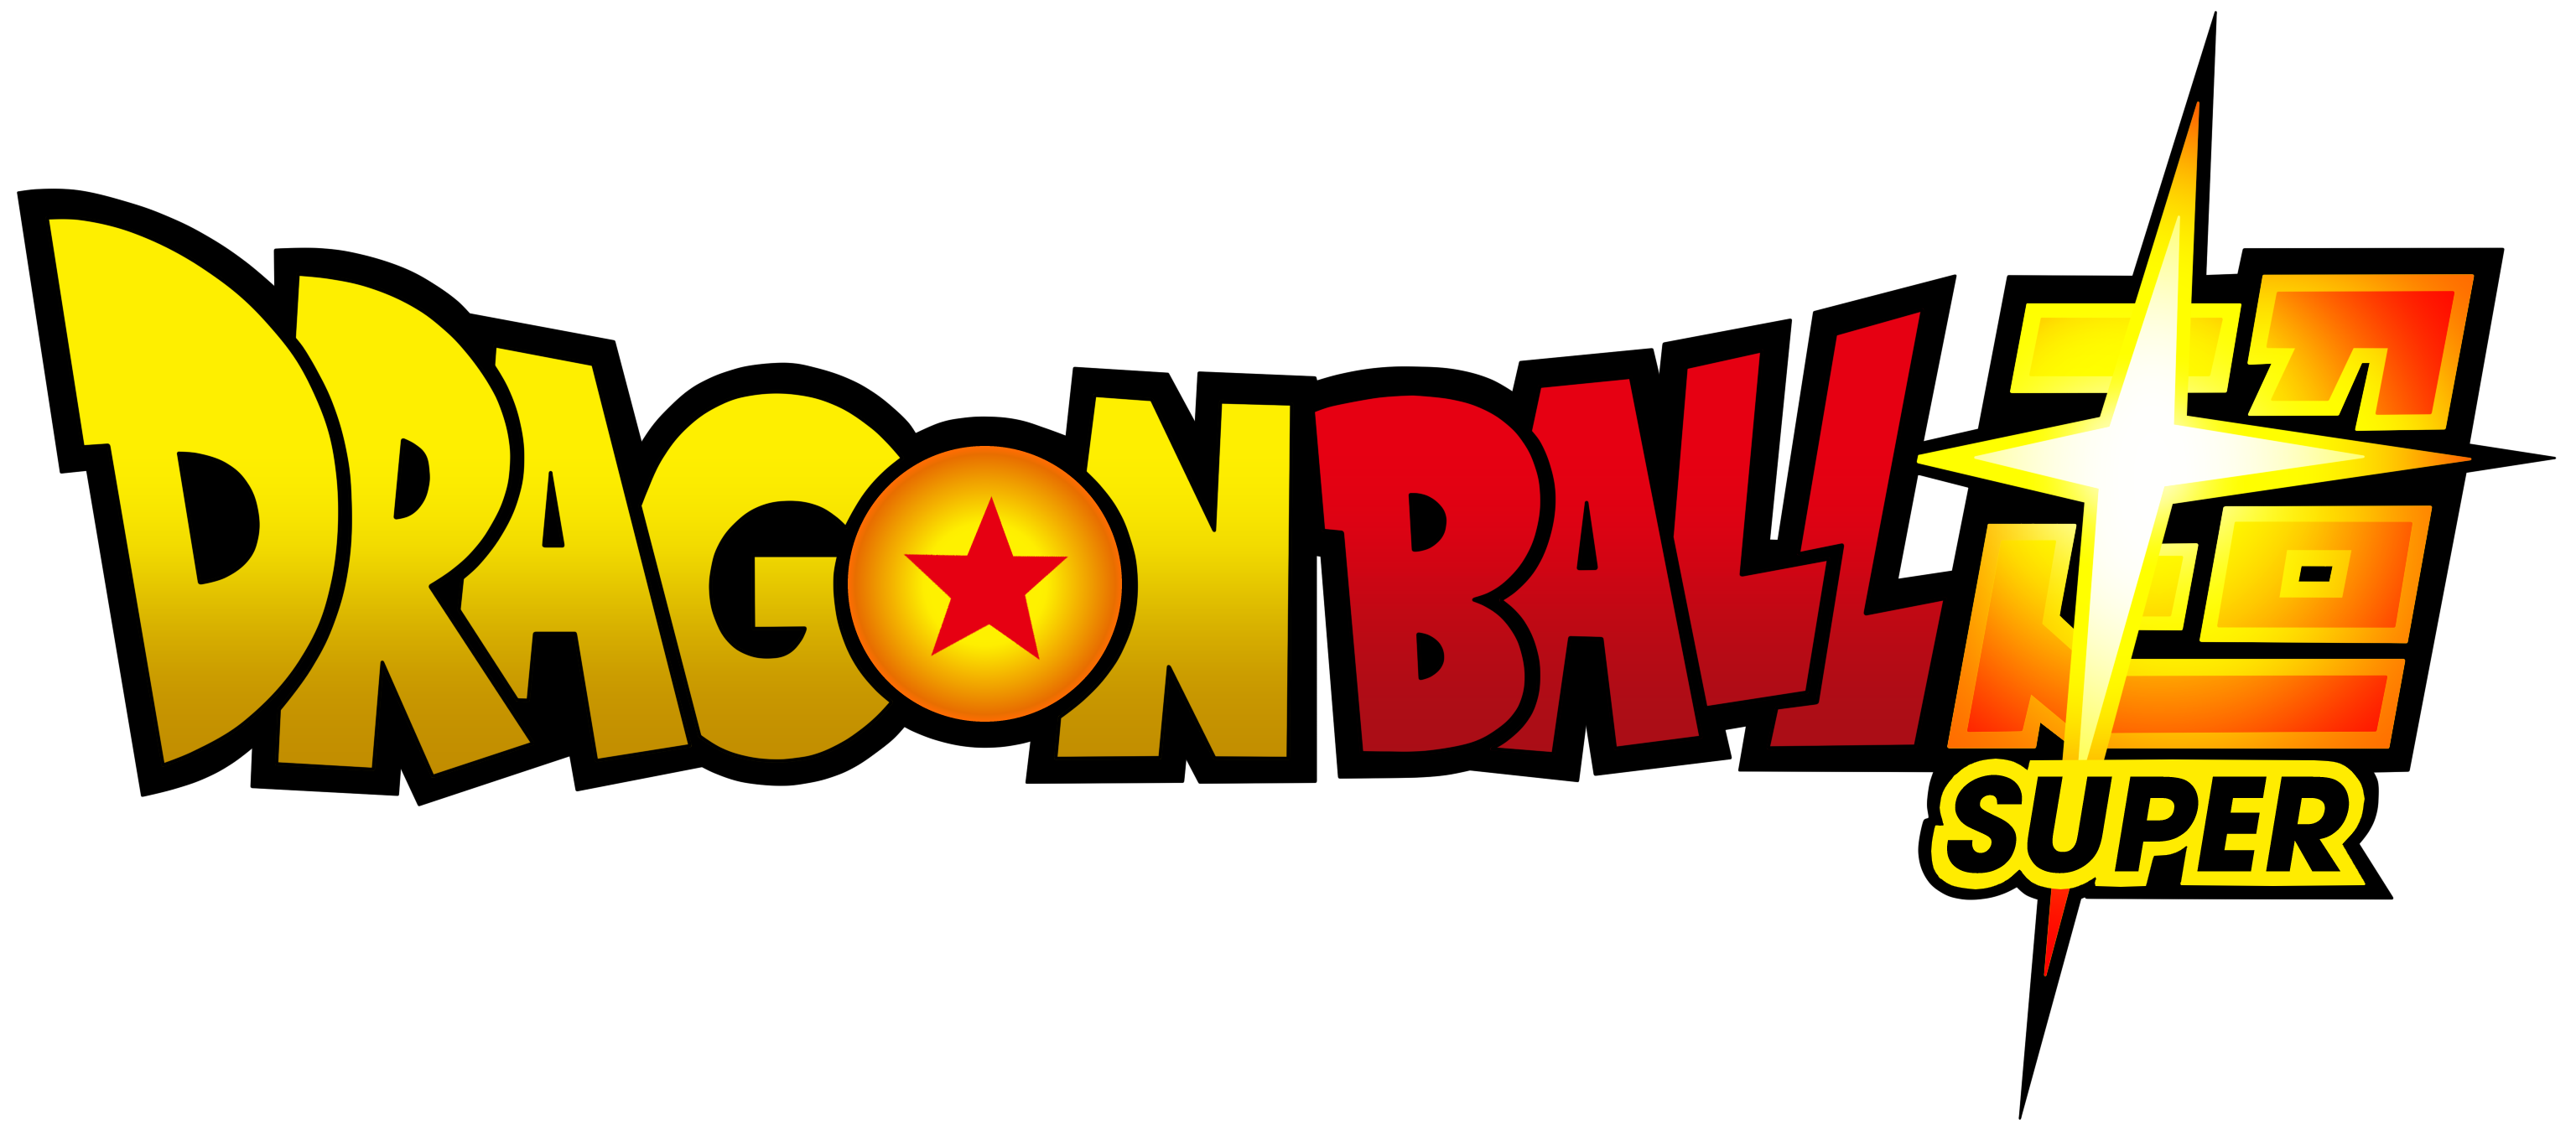 Dragon Ball Super Logo by VictorMontecinos